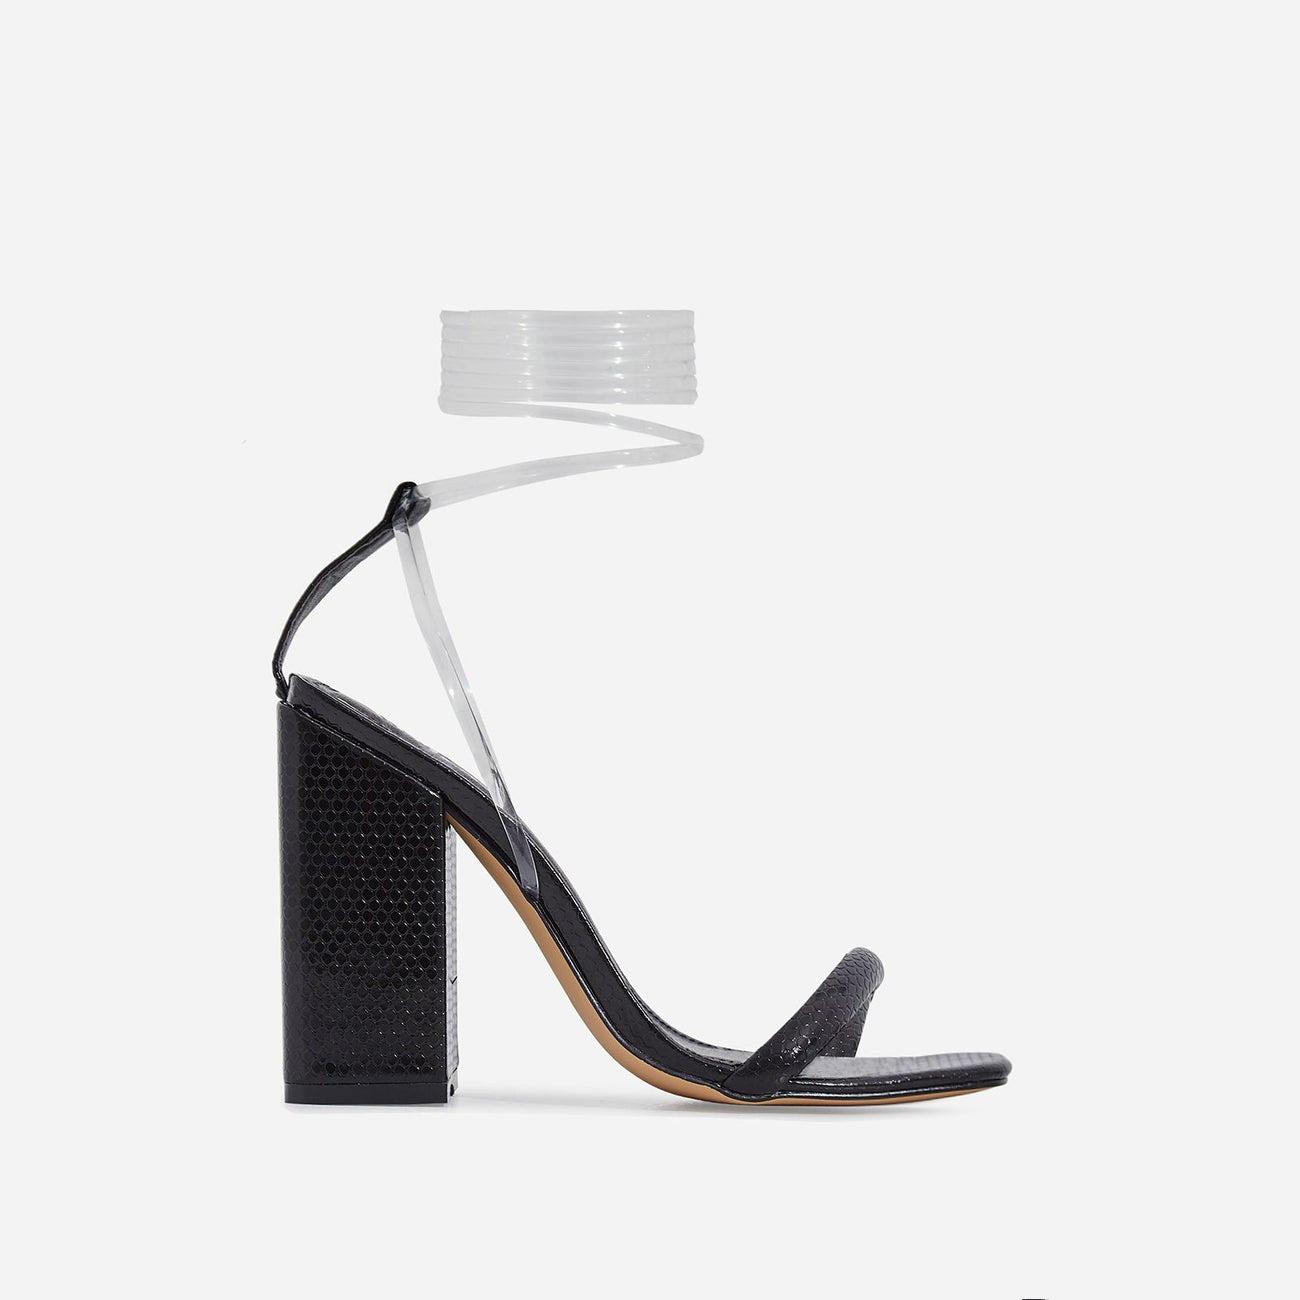 Mariah Perspex Lace Up Block Heel In Black Snake Print Patent